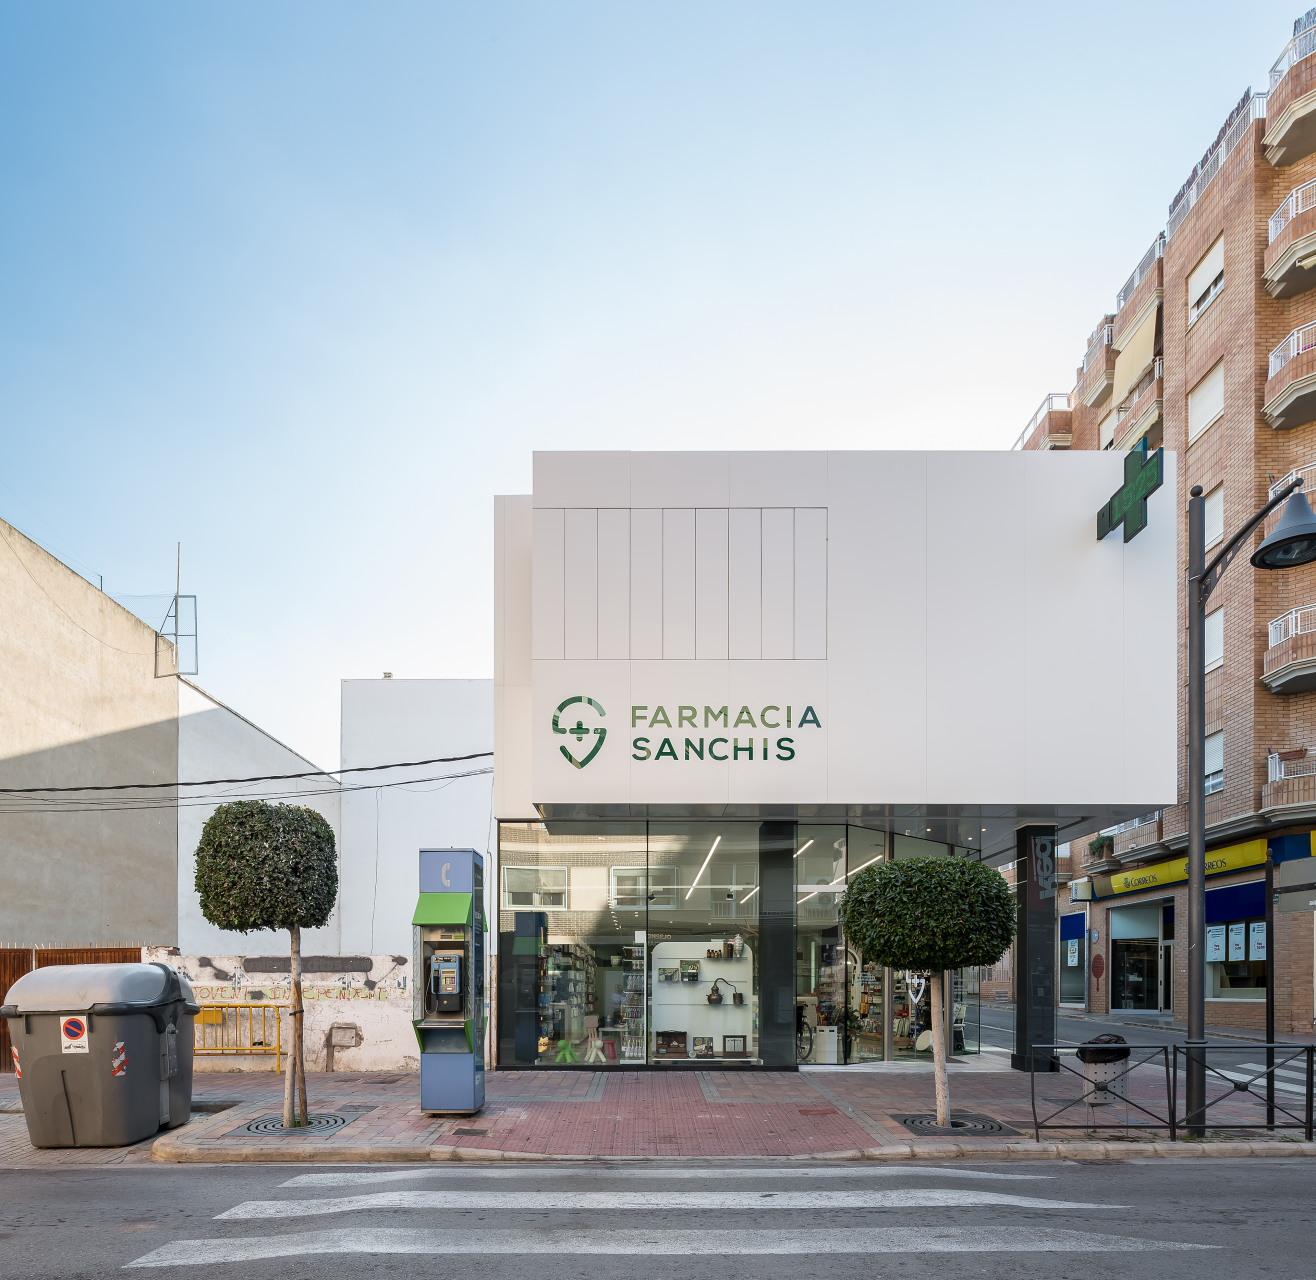 fotografia-arquitectura-valencia-german-cabo-d'estudio-farmacia-sanchis-ribarroja (1)